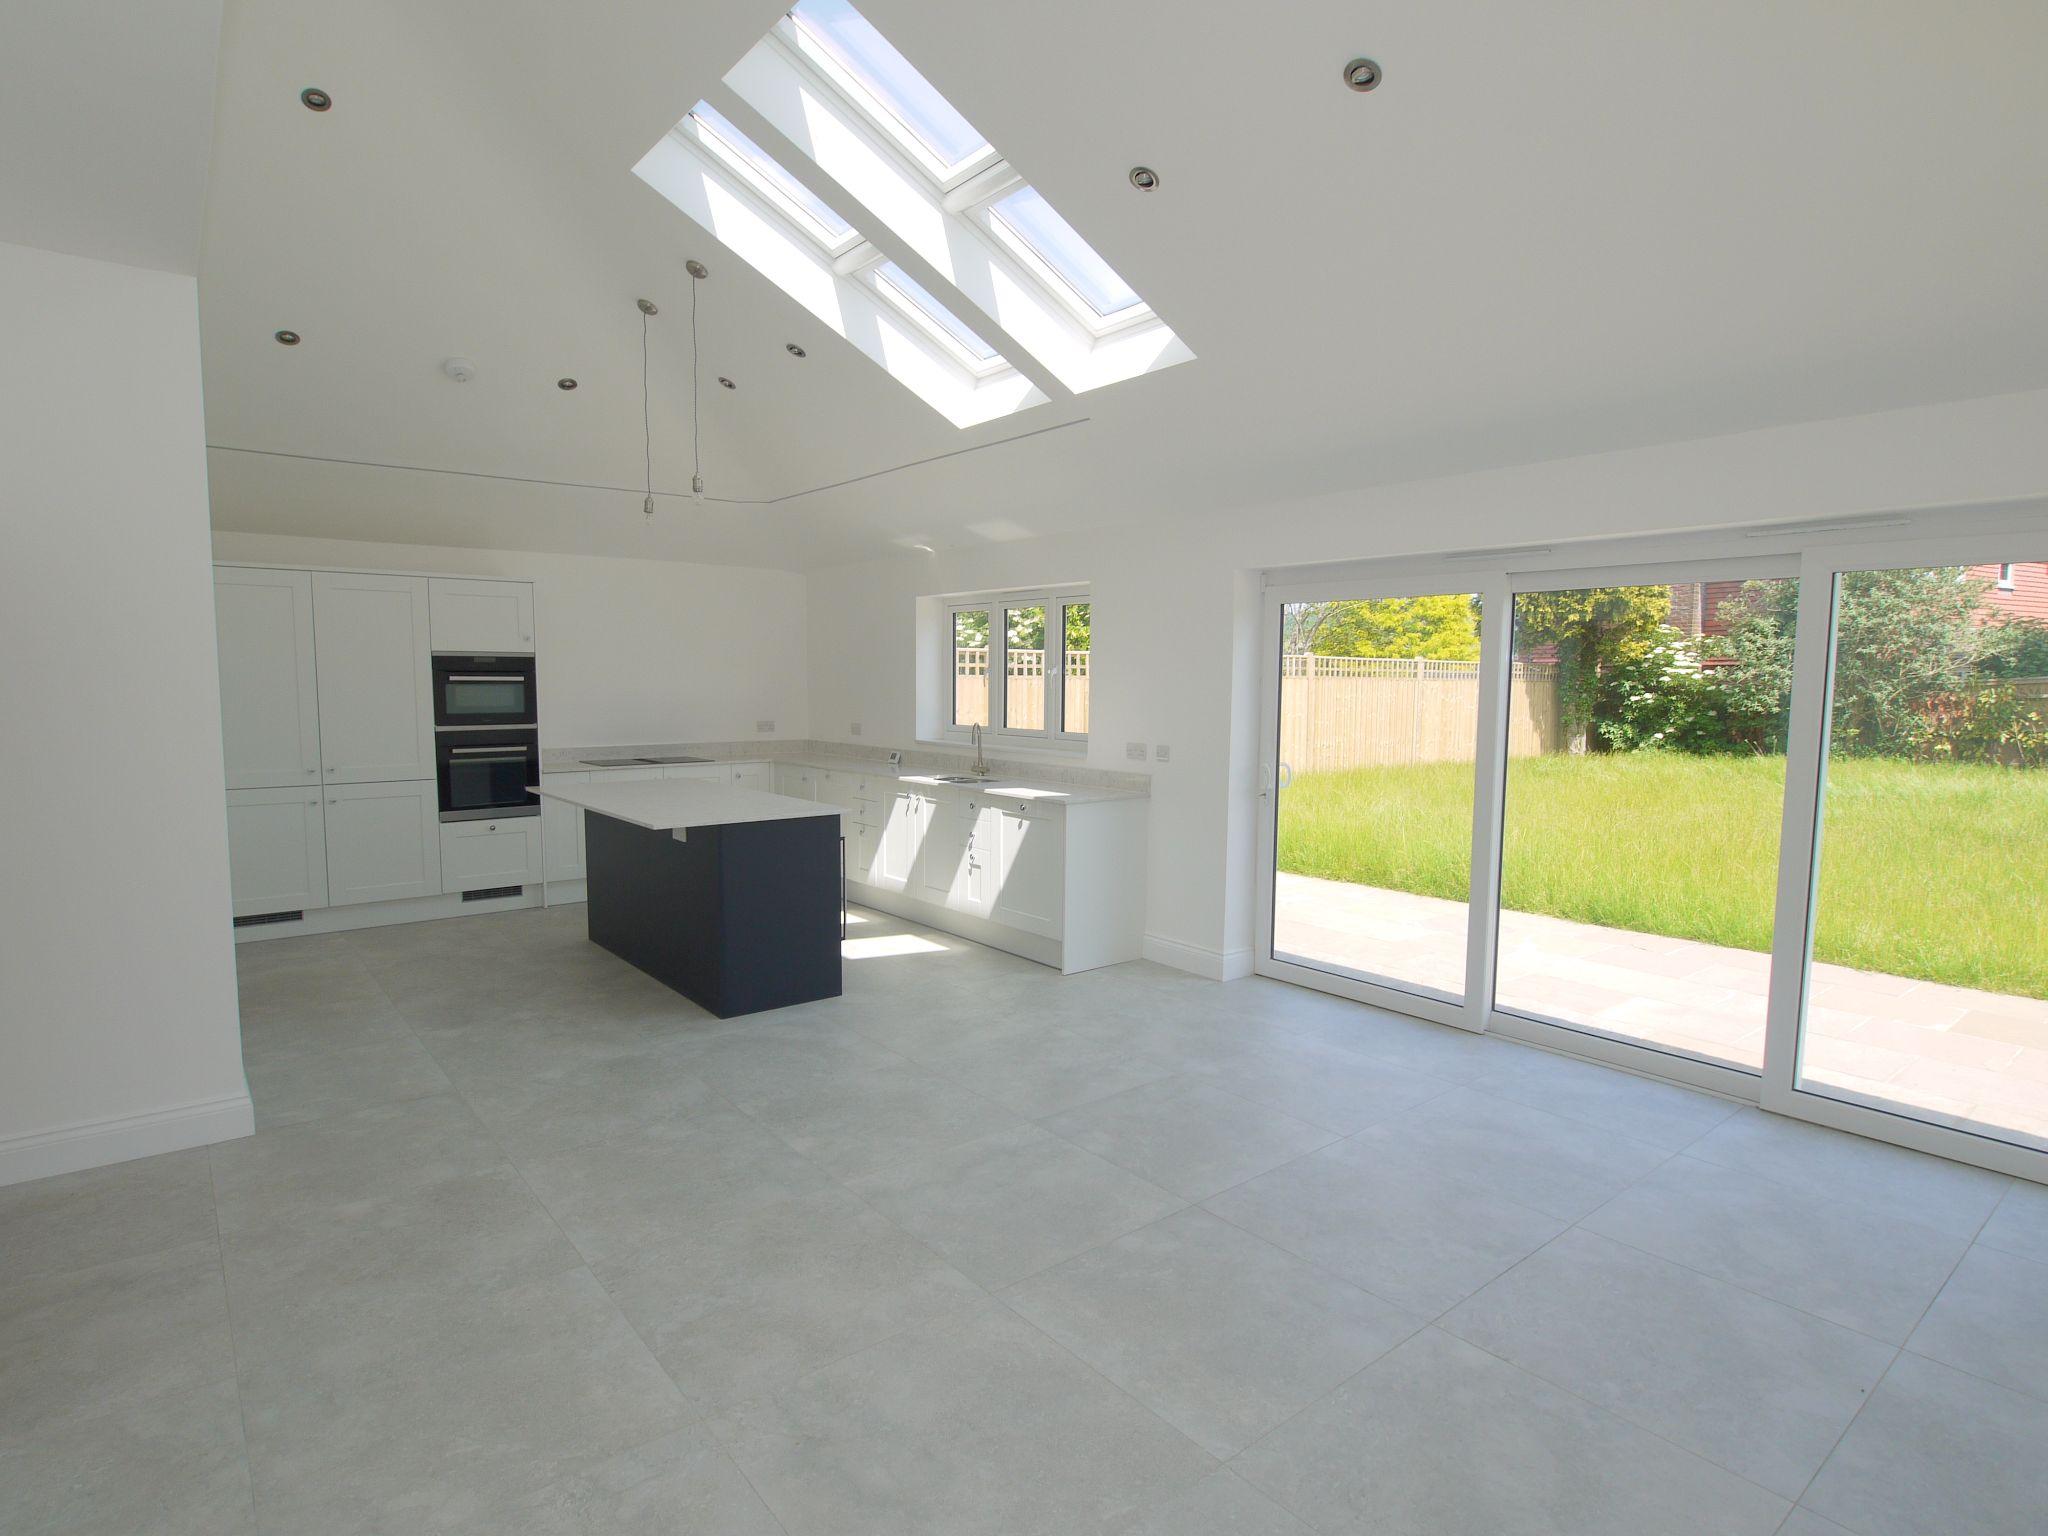 3 bedroom detached bungalow For Sale in Sevenoaks - Photograph 1